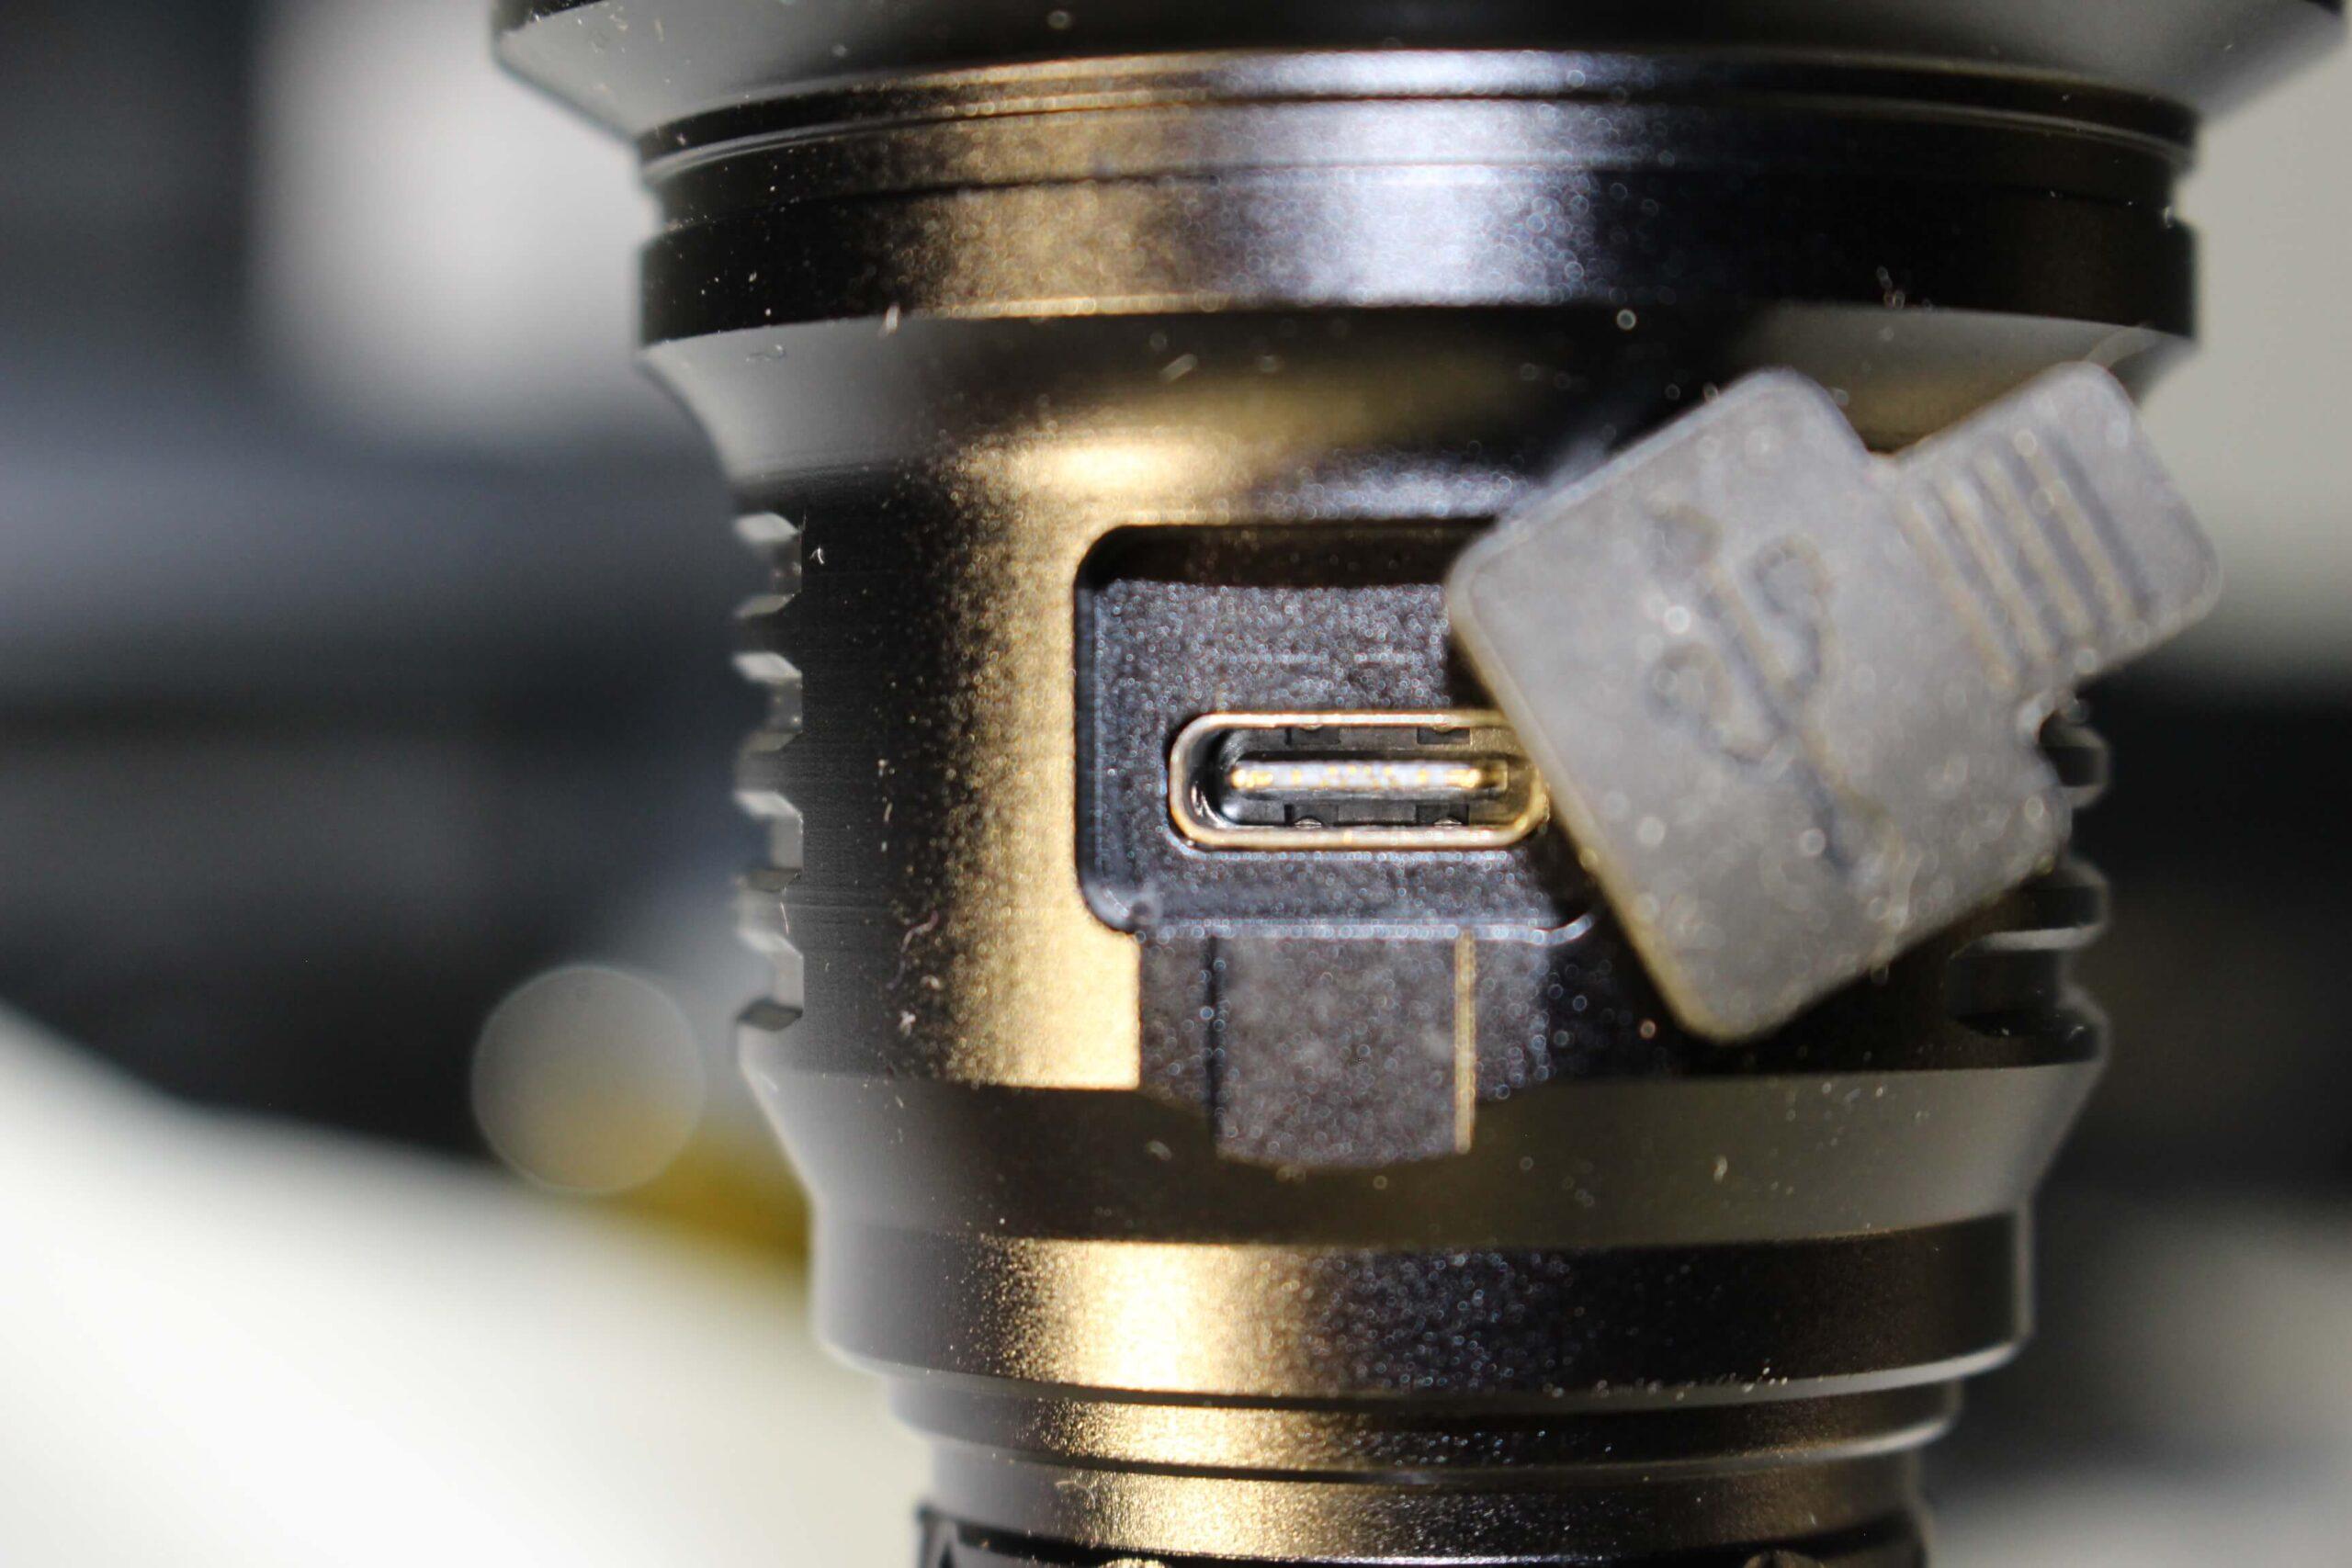 Astrolux Ec03 6700 Lumen Rechargeable Flashlight Review